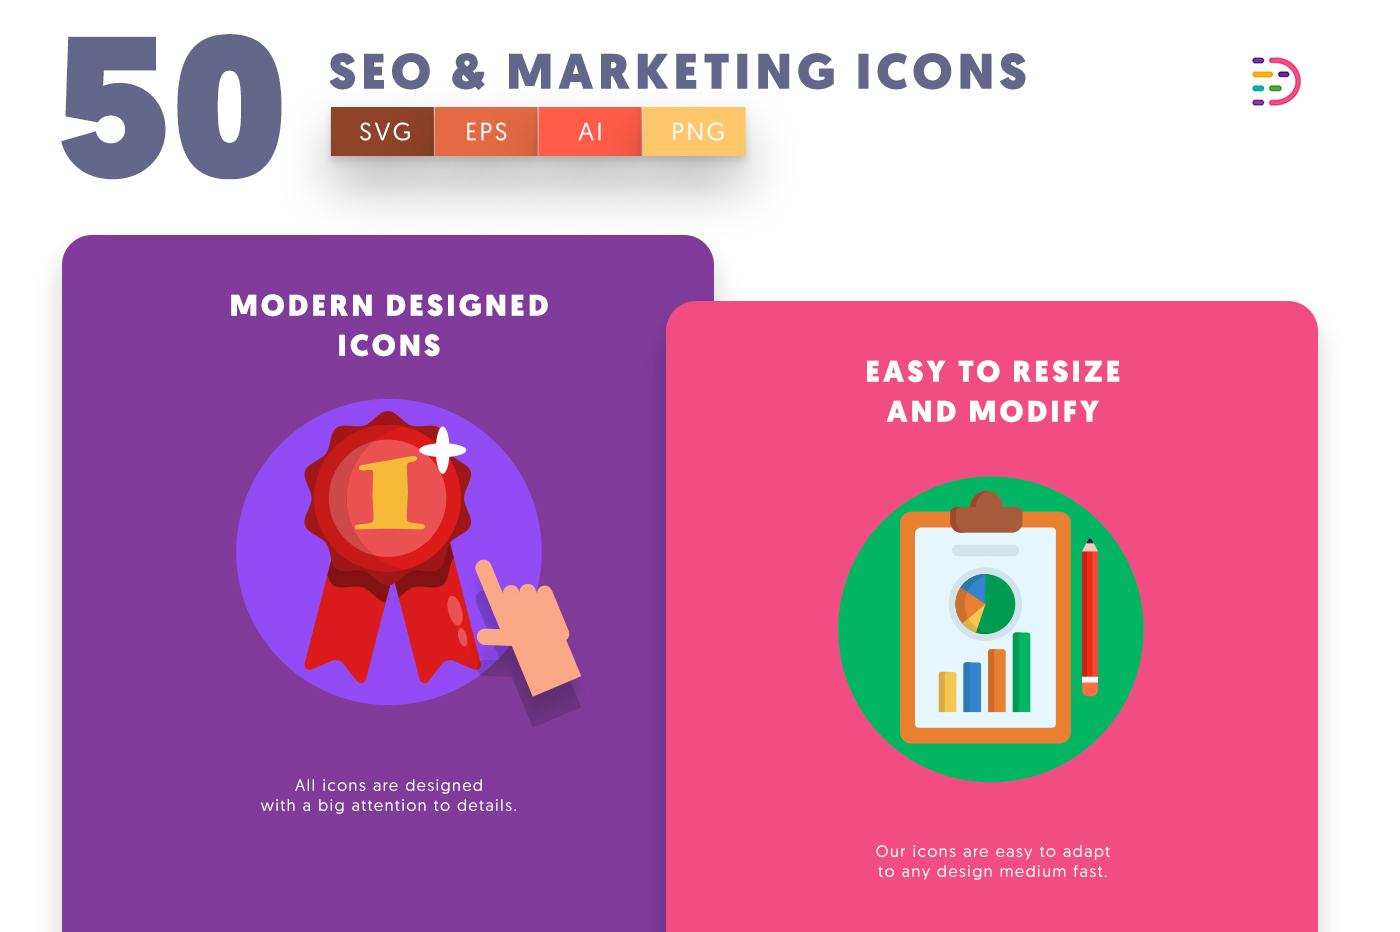 Design ready 50 Seo & Marketing Icons